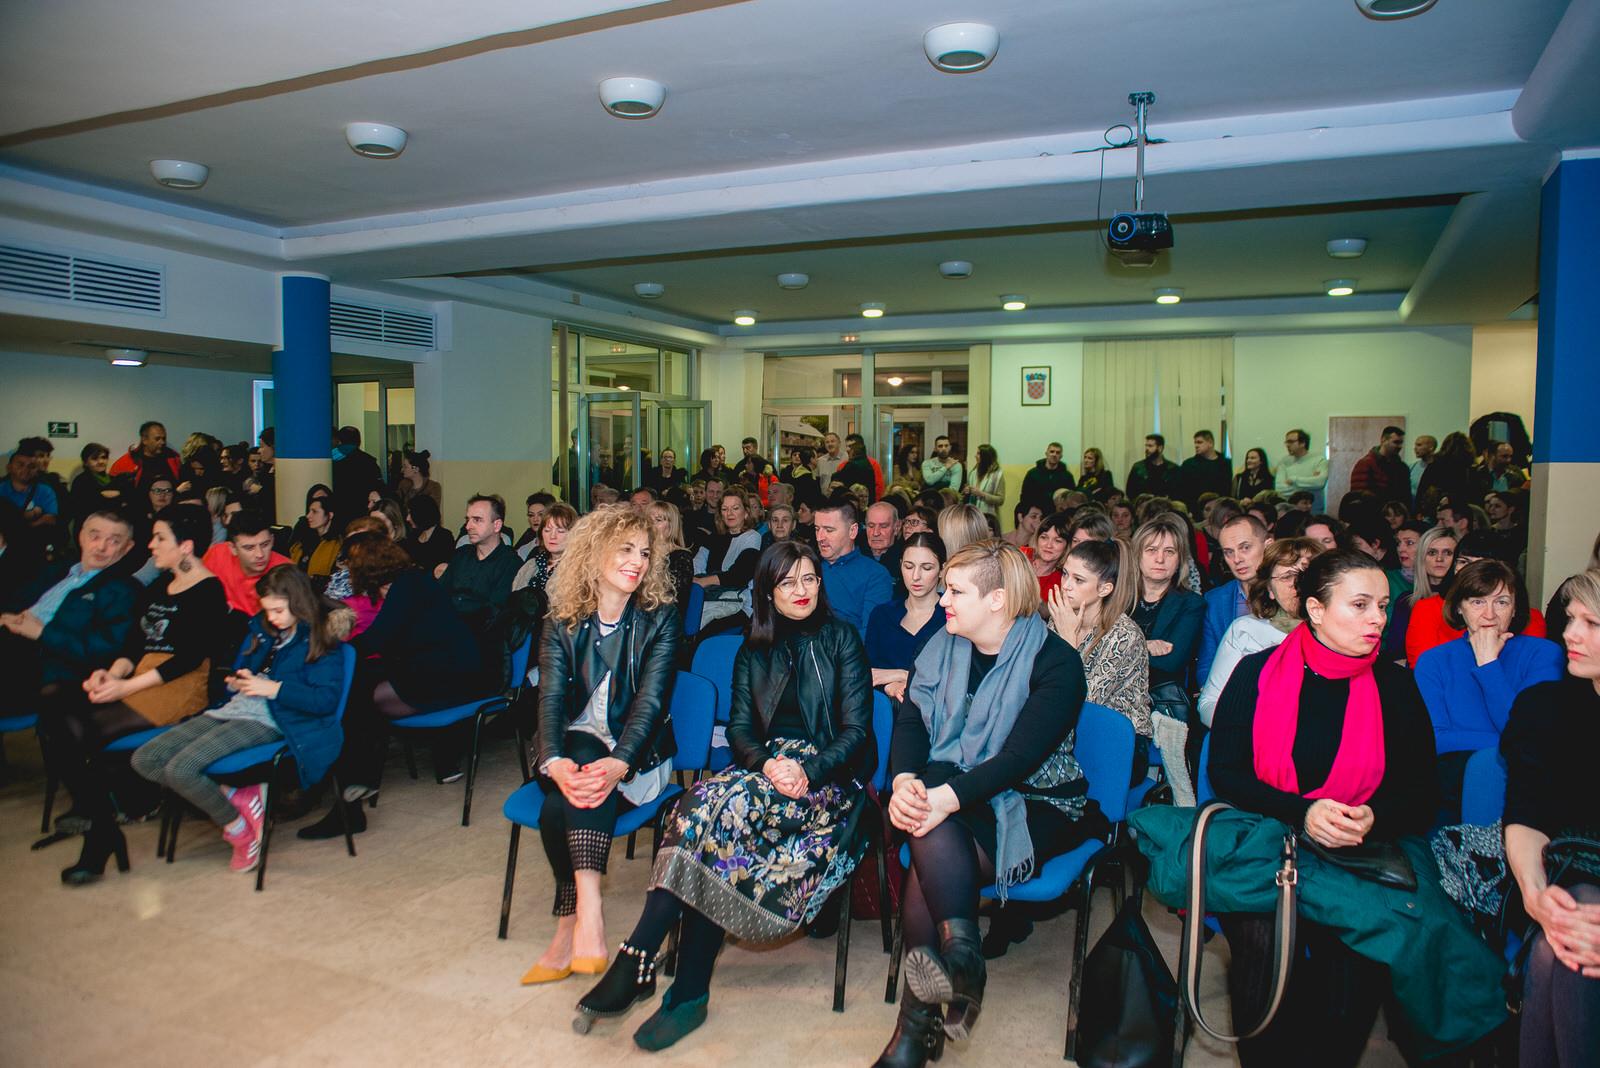 likaclub_koncert-klapa-cambi_kic-gospić_2019-4